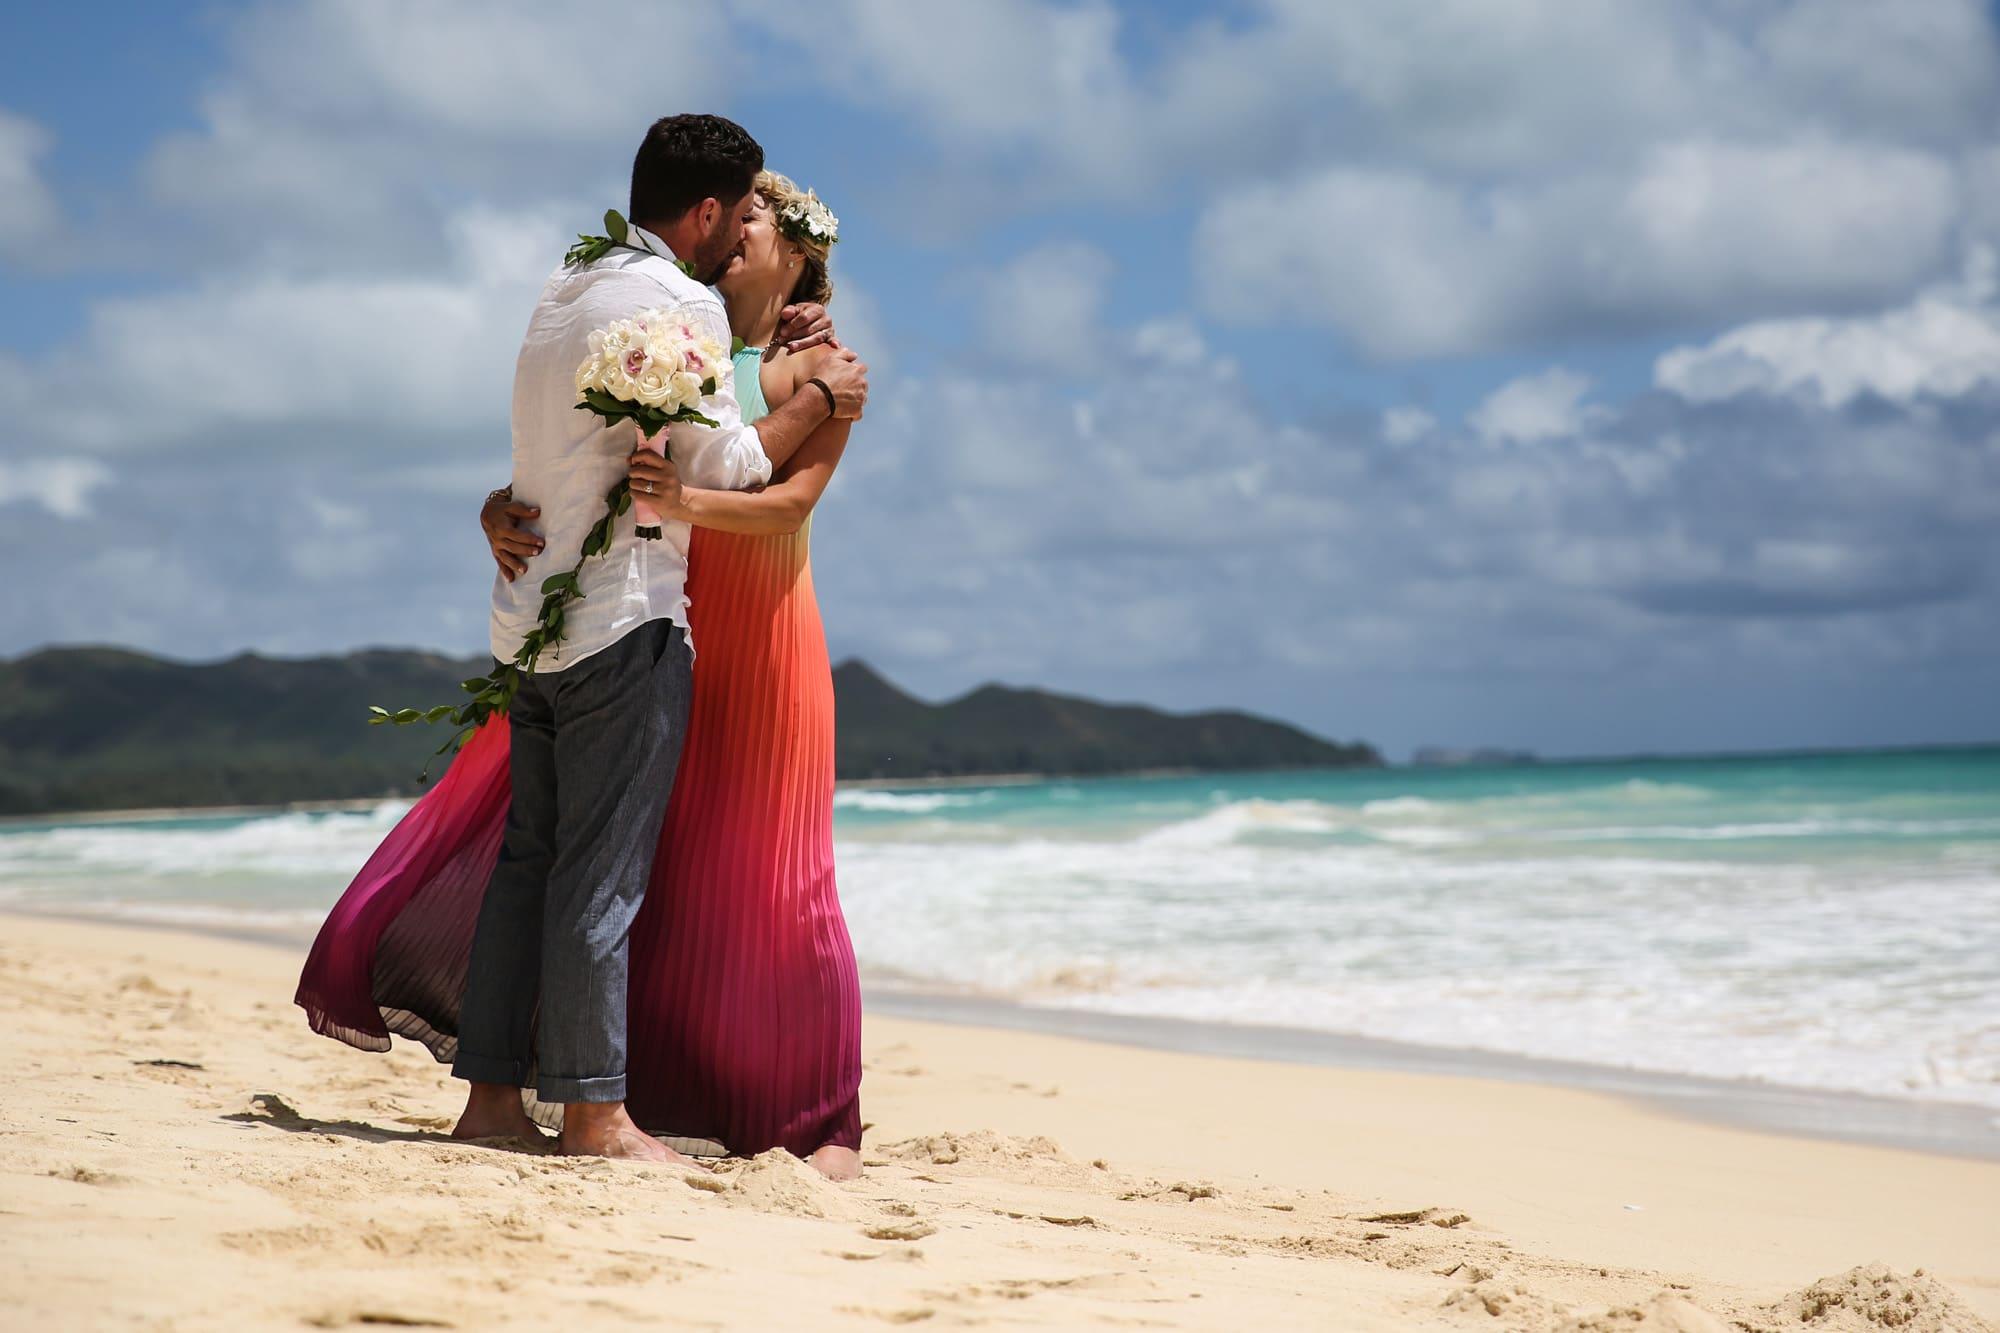 Intimate Hawaii Wedding in Full Color